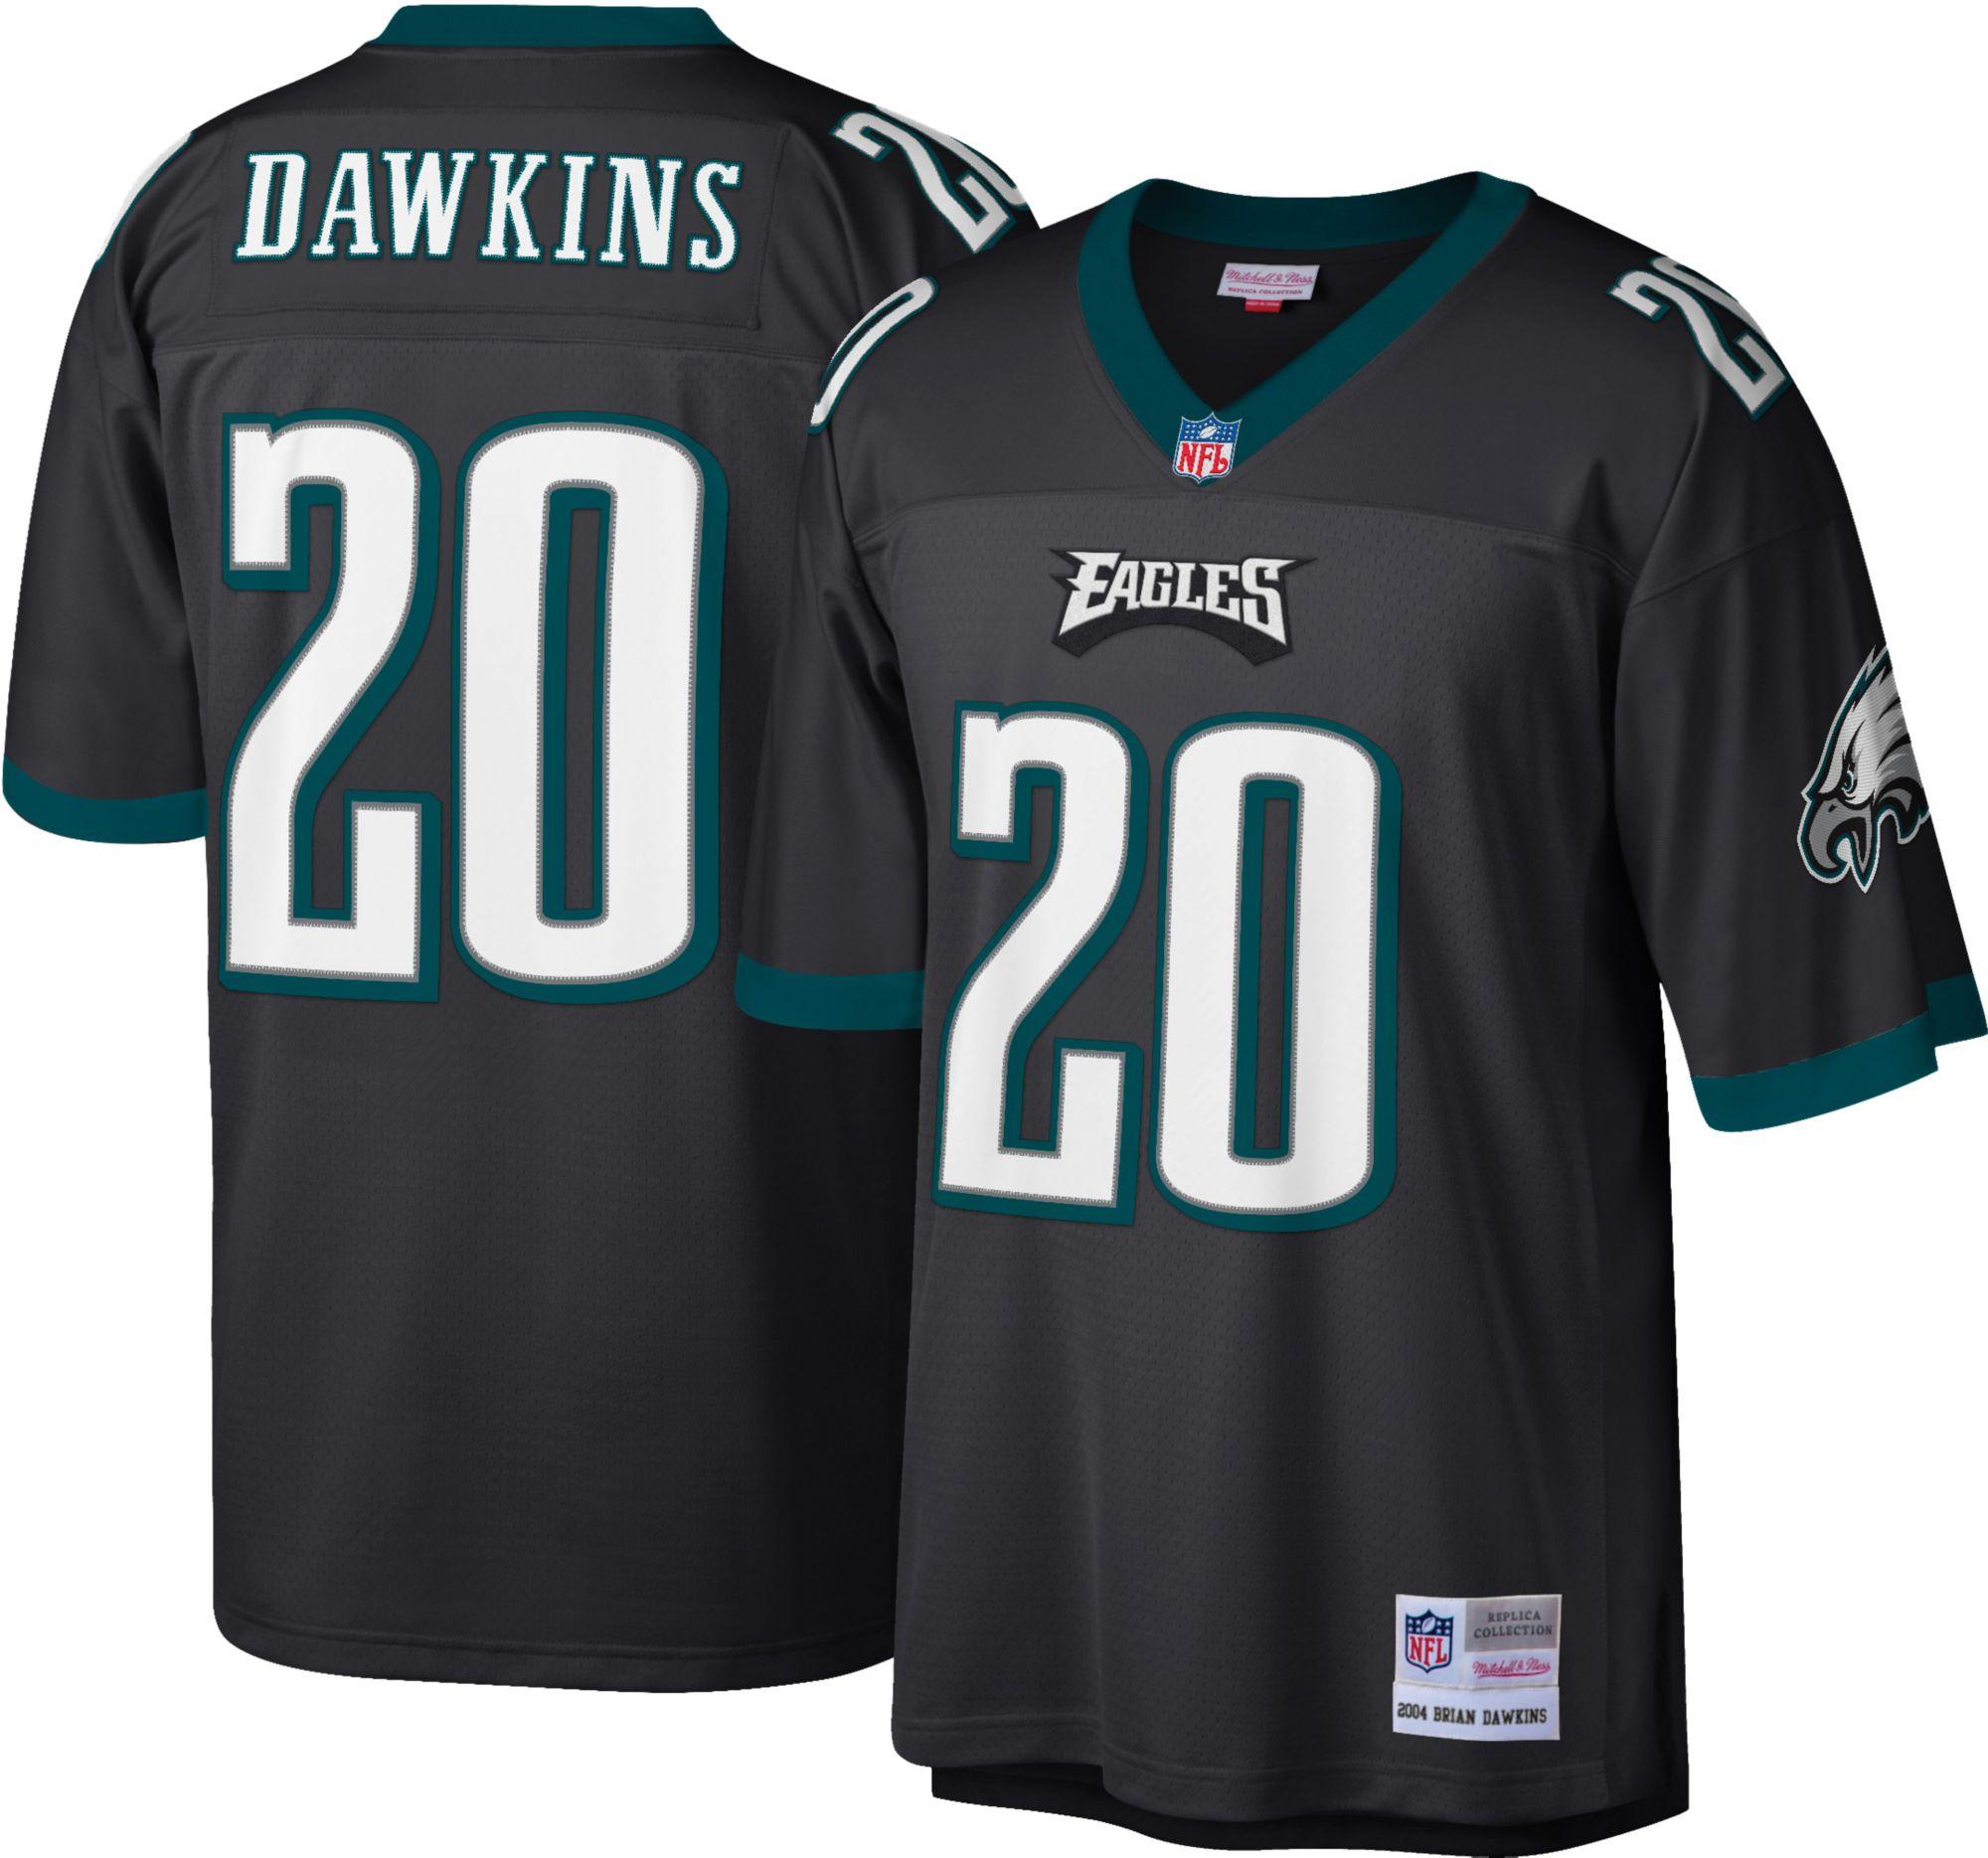 dawkins eagles jersey